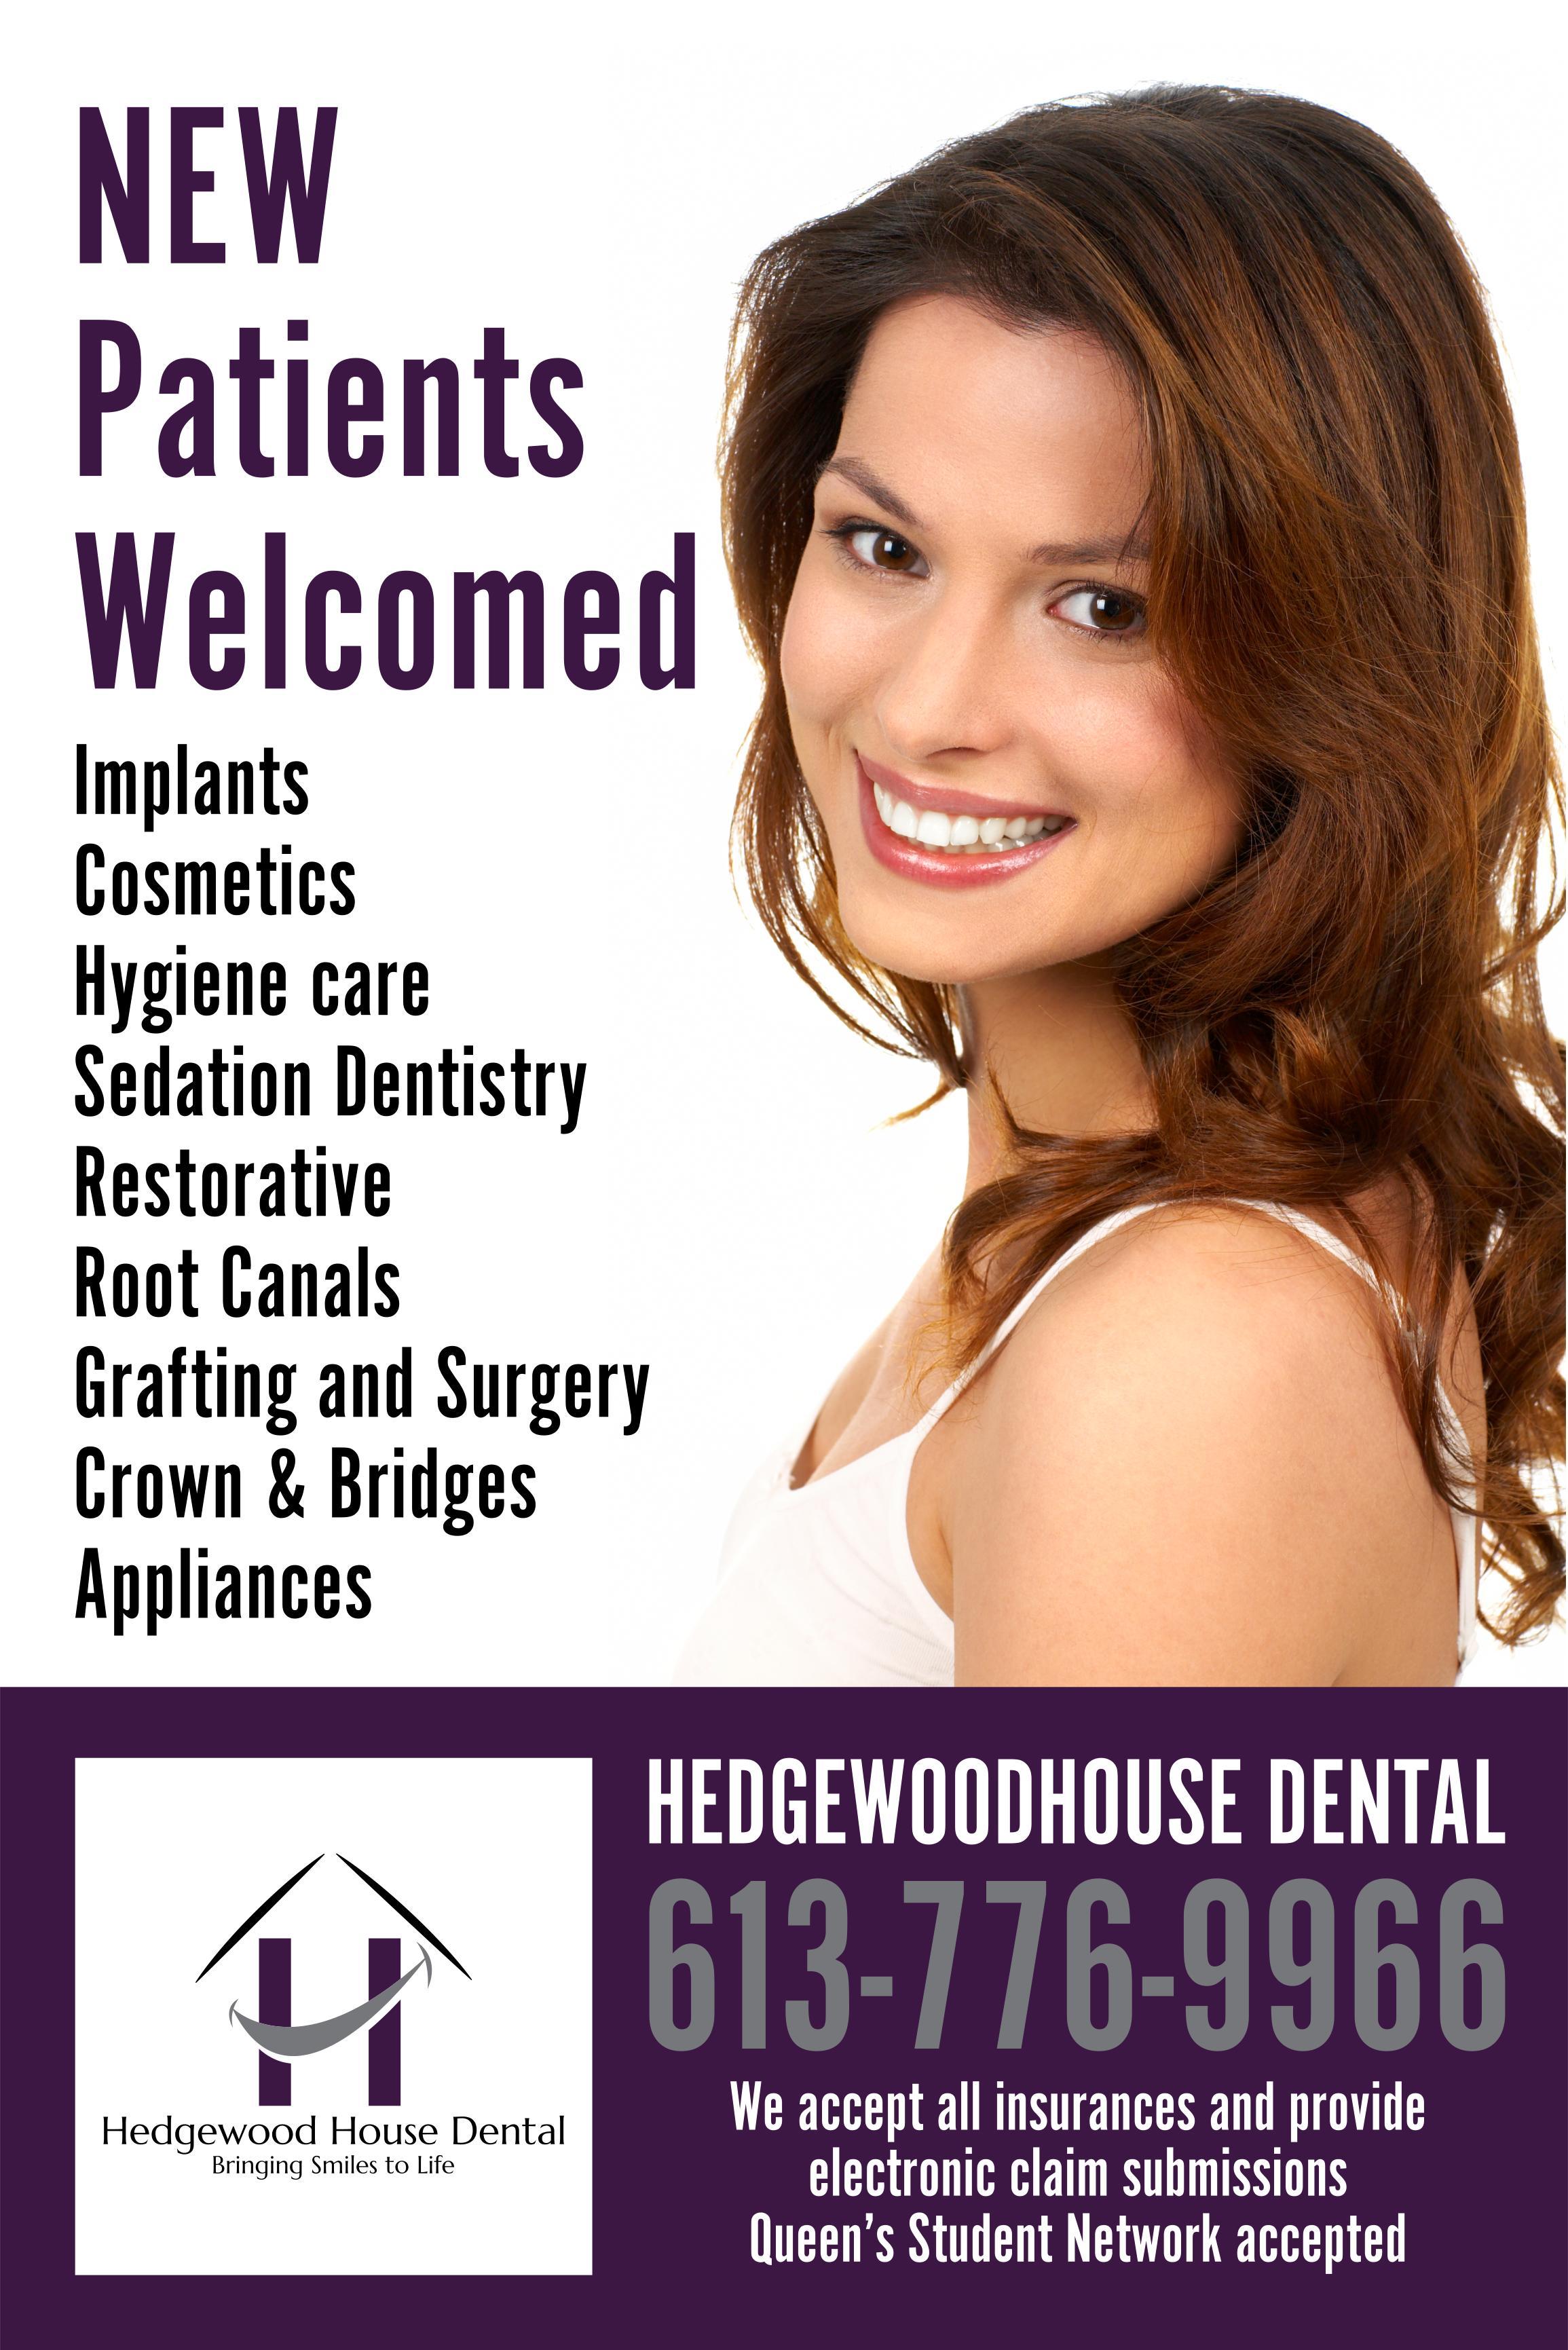 hedgewoodhouse dental a-frame 2